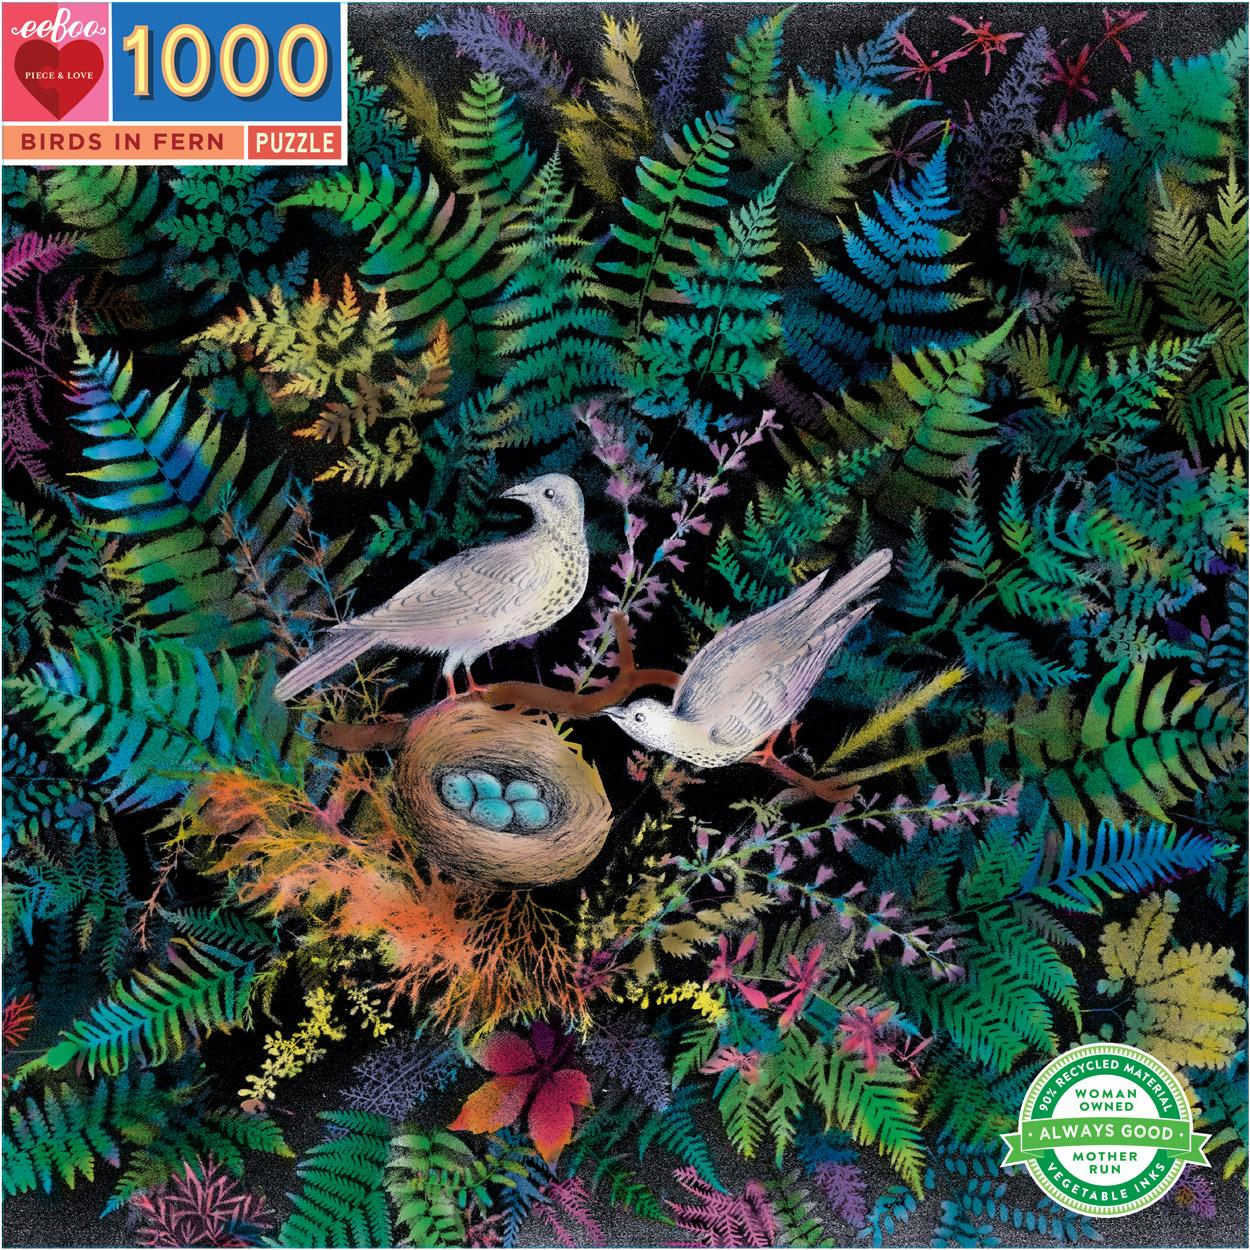 Birds & Ferns Birds Jigsaw Puzzle